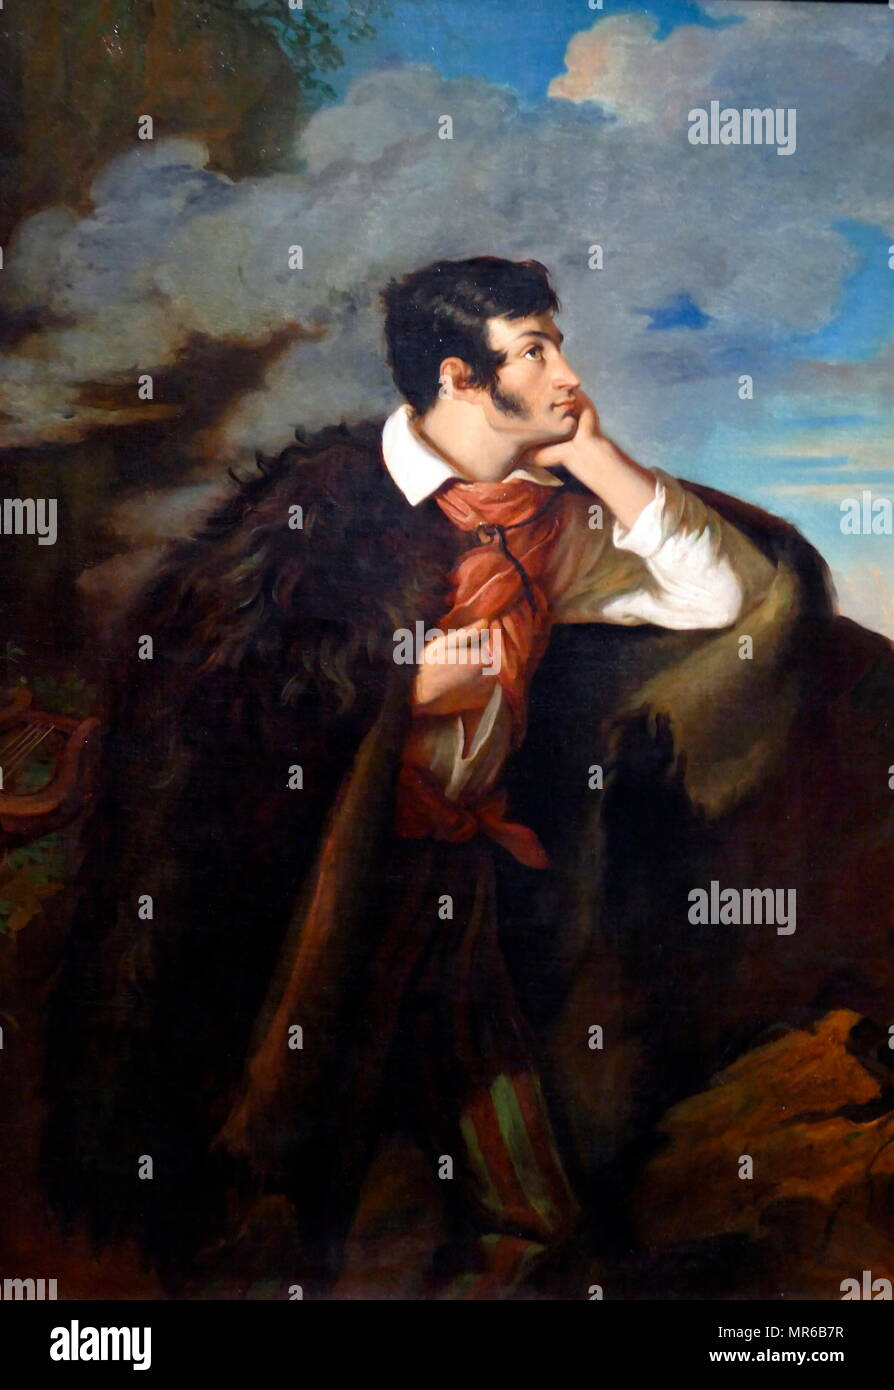 Portrait of Adam Mickiewicz. Date 1827-1828, by Walenty Wankowicz (1799–1842). Adam Bernard Mickiewicz (1798 – 1855) was a Polish poet, dramatist, essayist, publicist, translator, professor of Slavic literature, and political activist - Stock Image